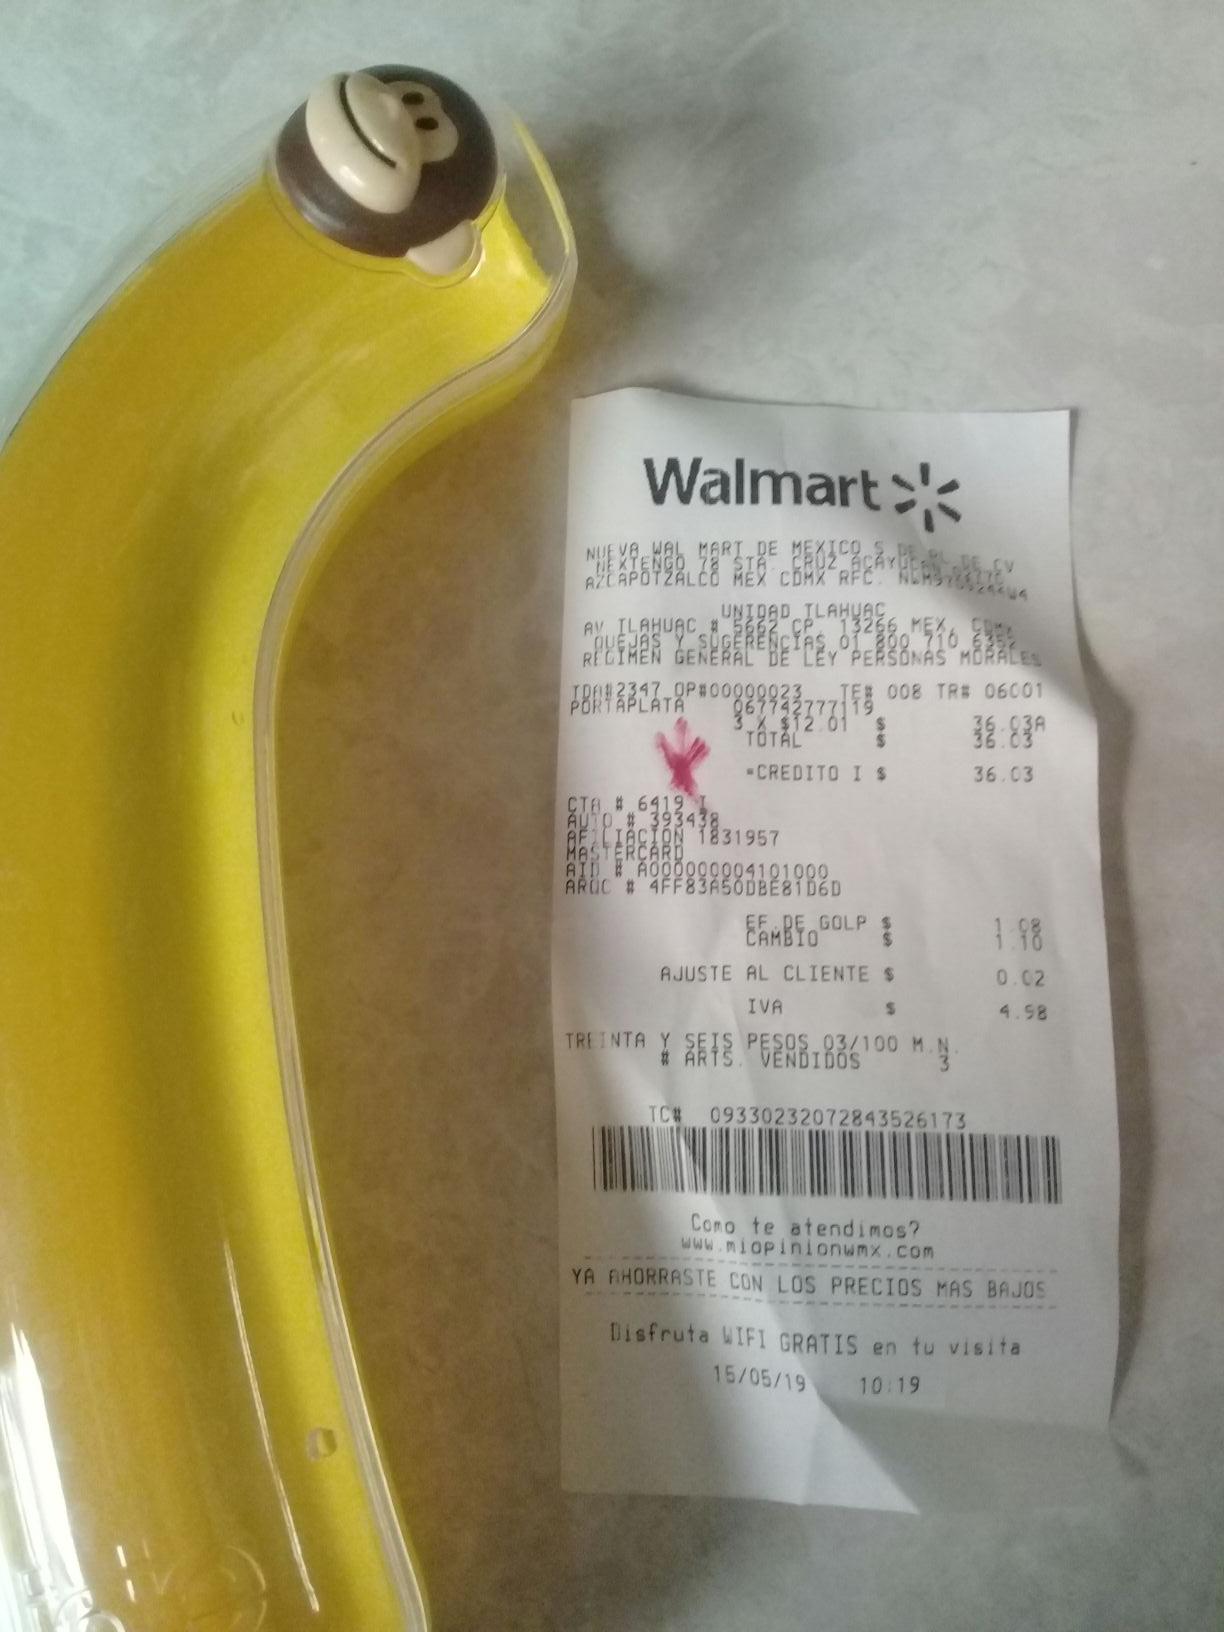 Walmart Tláhuac  porta plátano